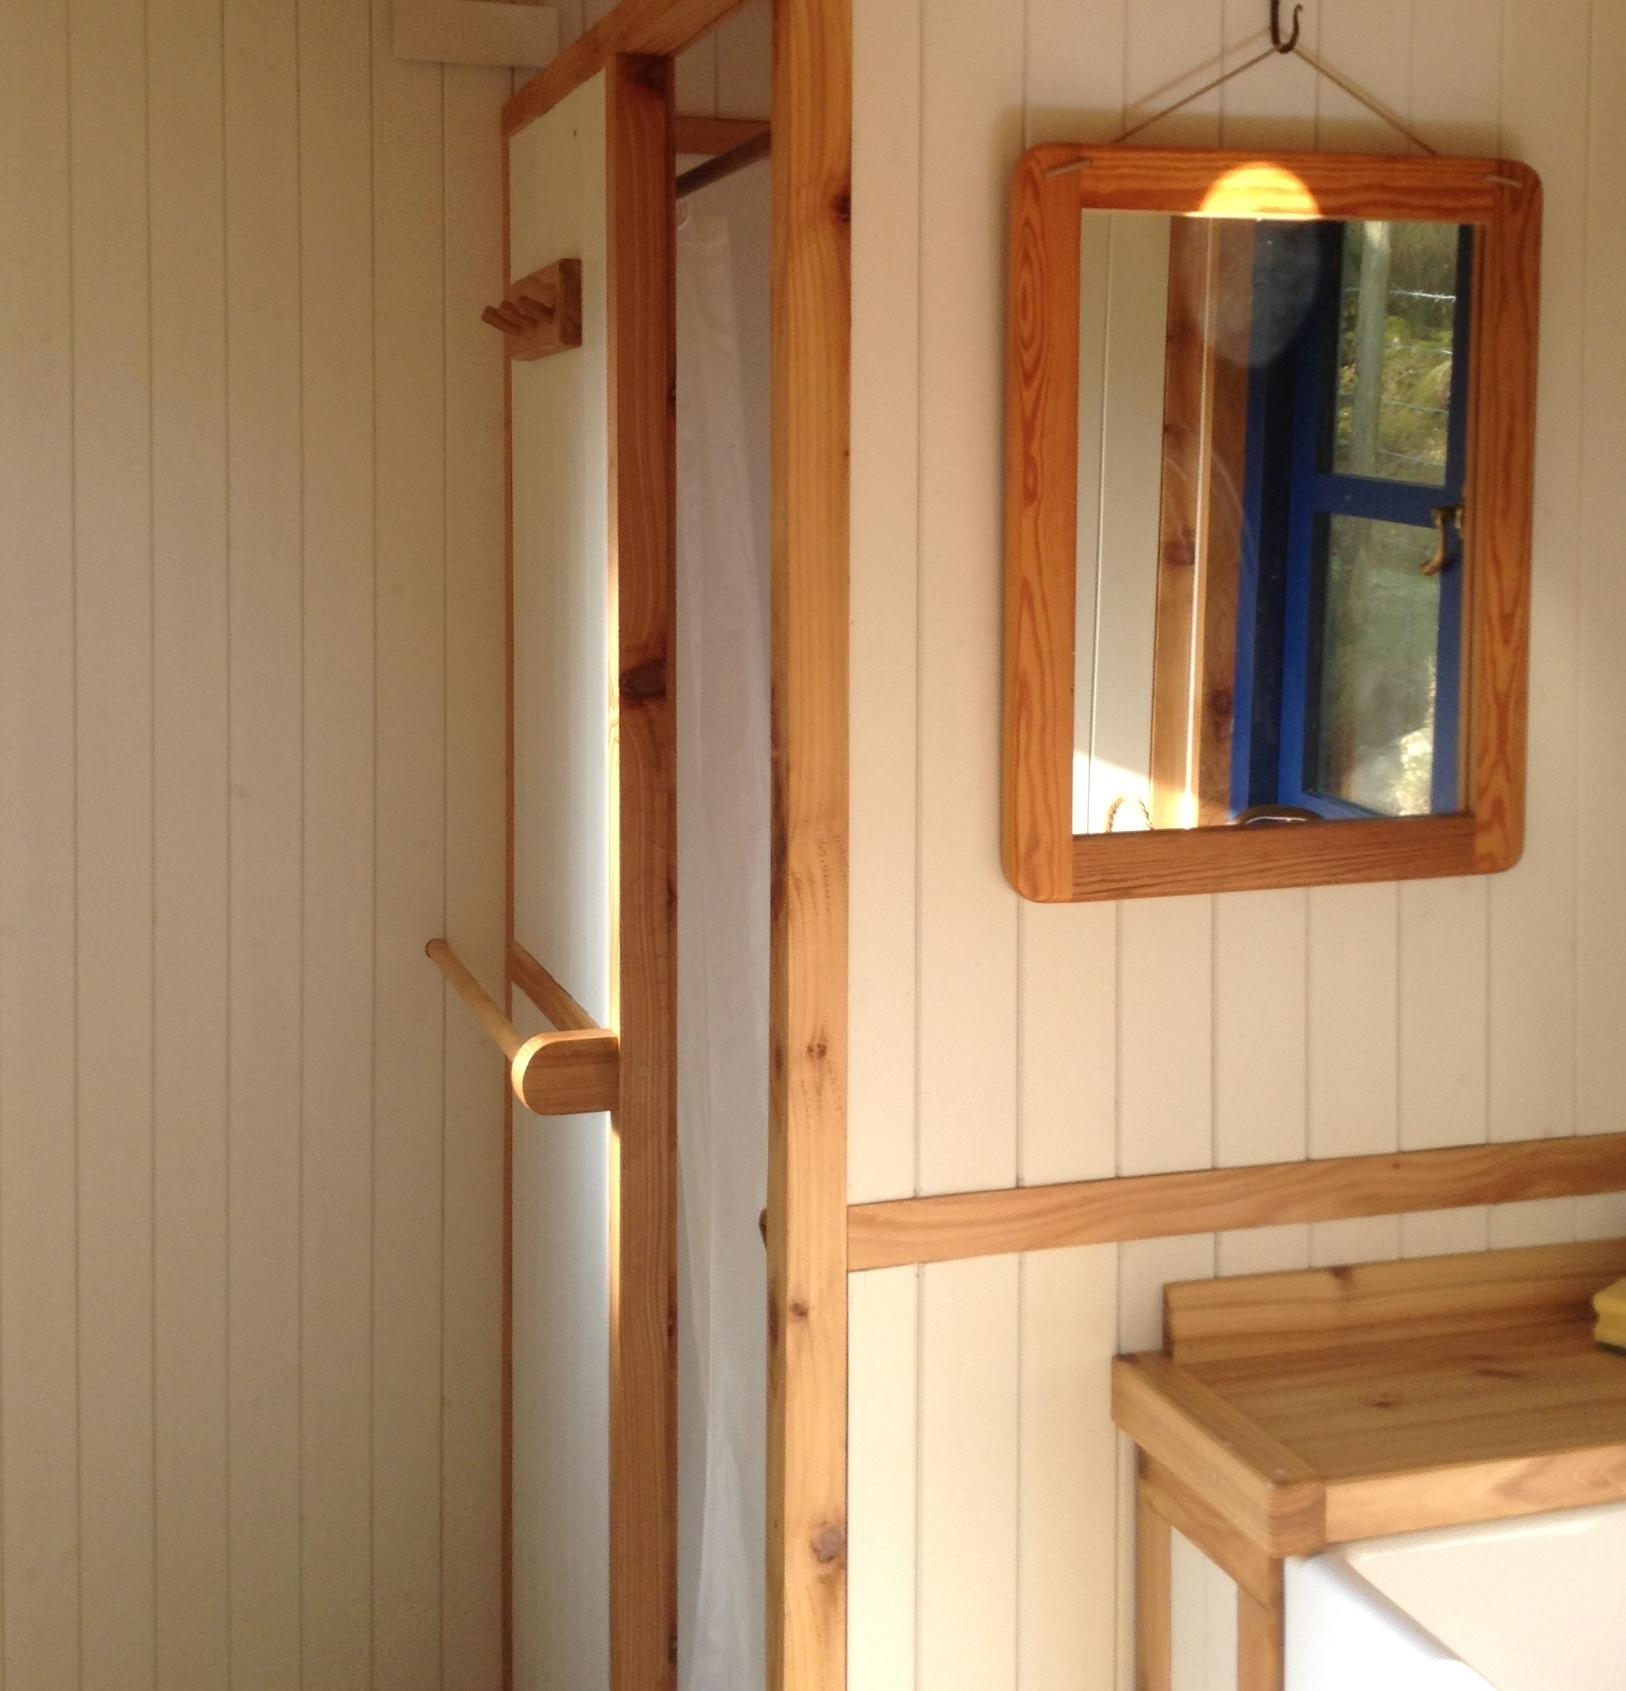 Bathroom wagon detail.